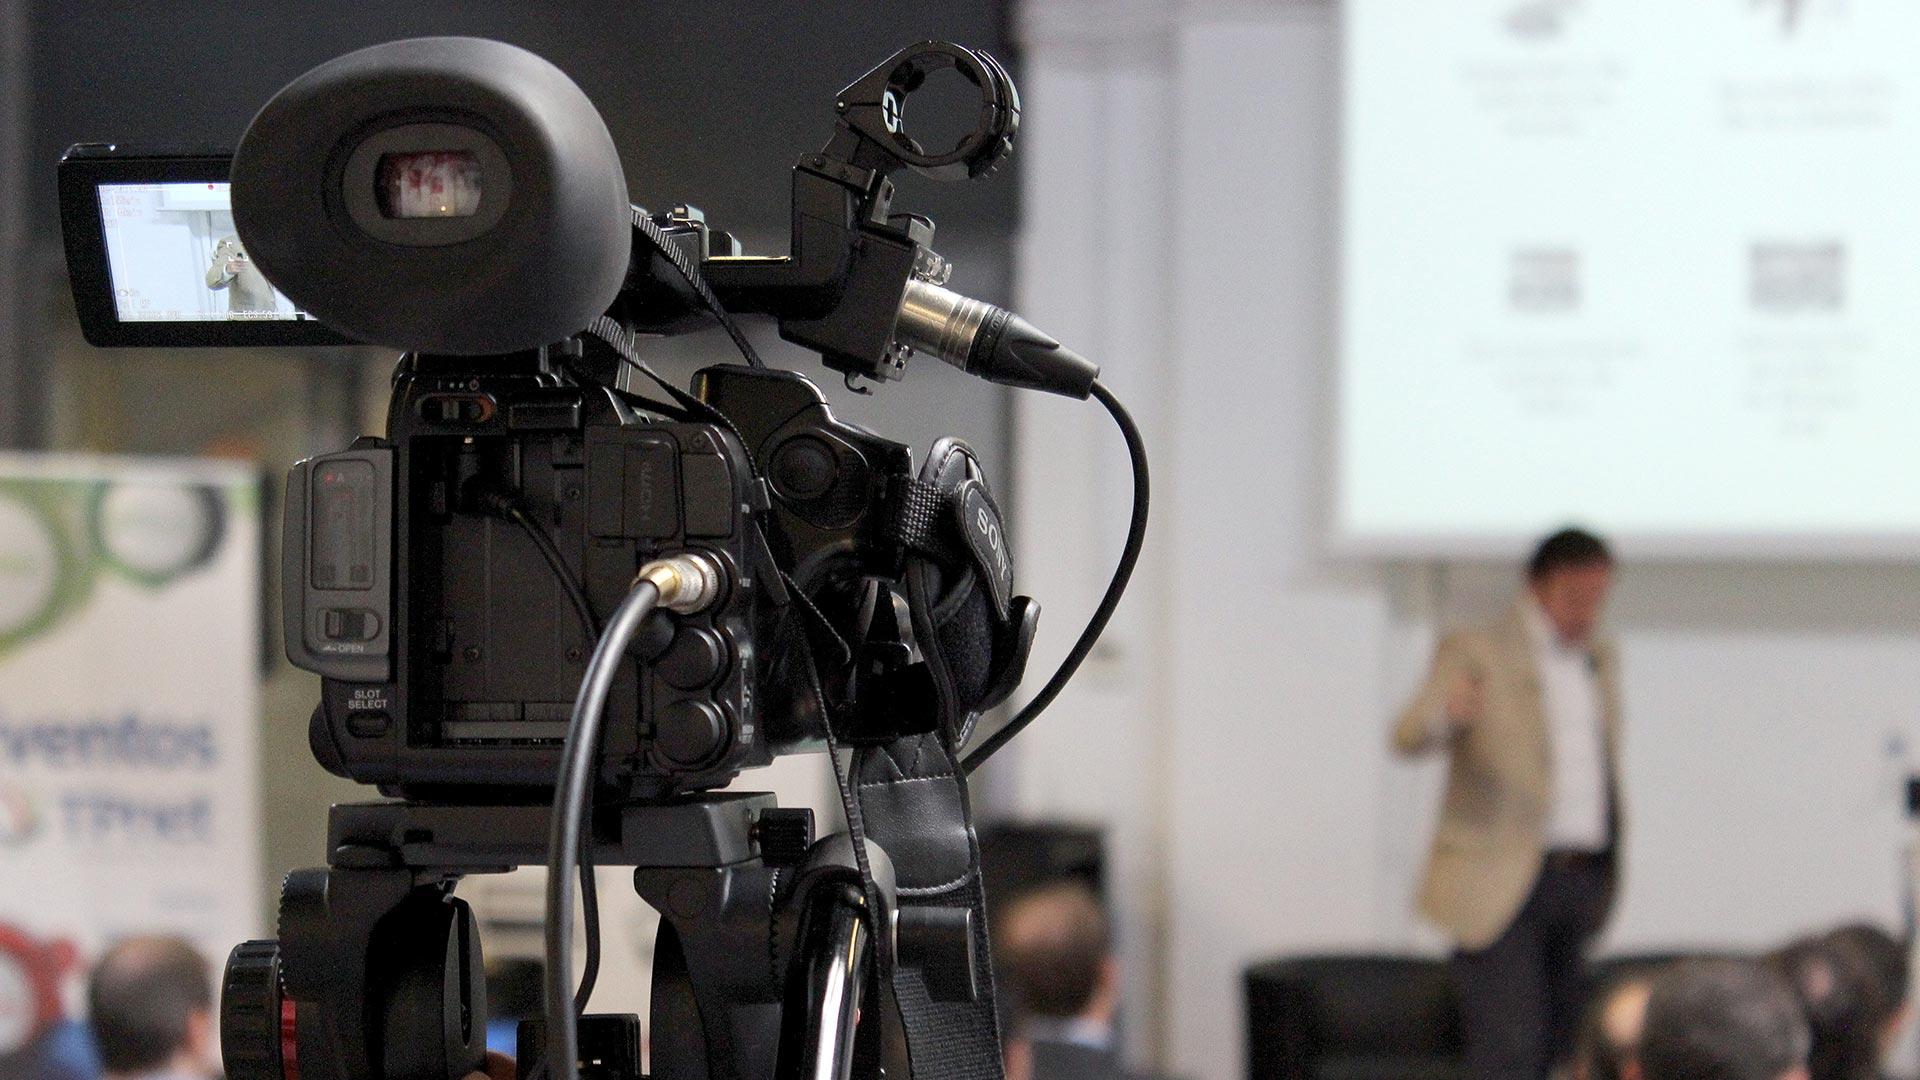 tpnet-eventos-encuentros-profesionales-iot-camara-streaming-2